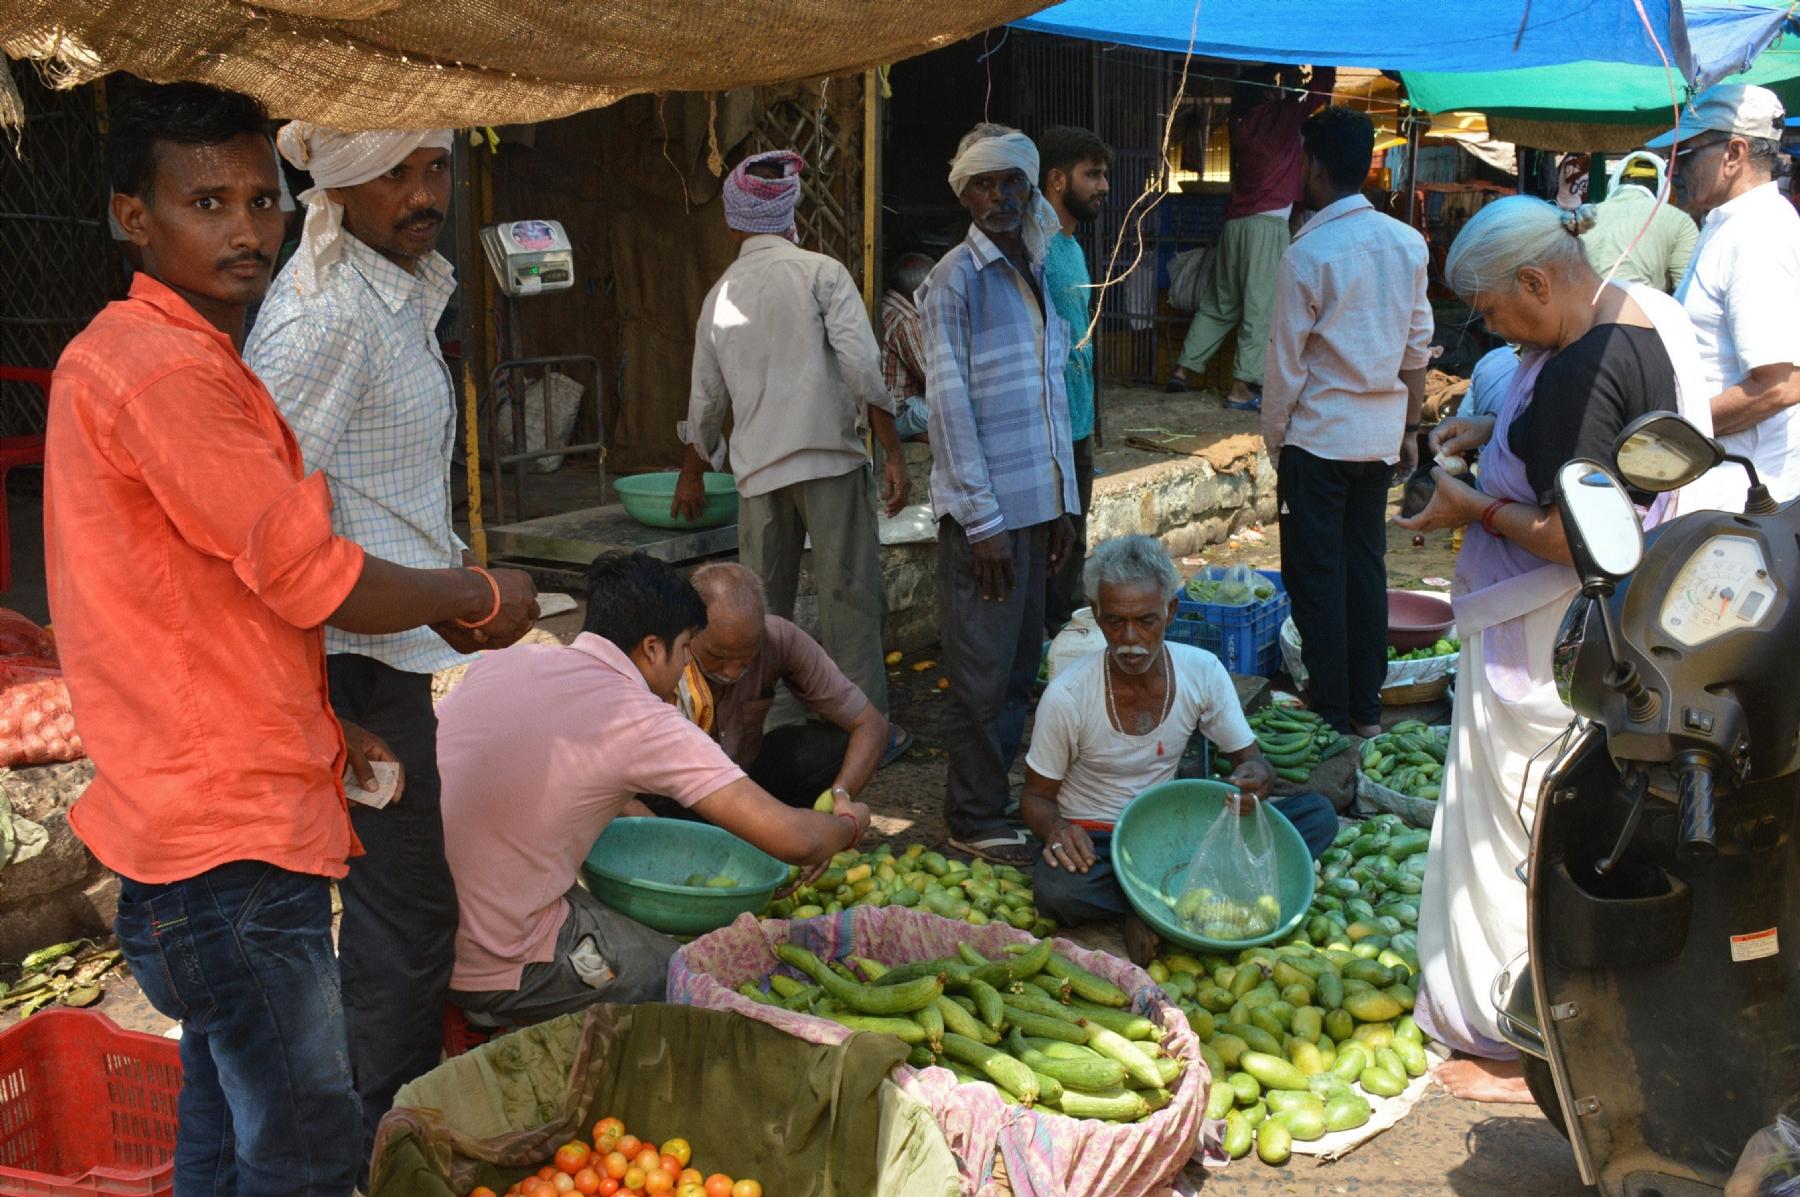 Farmers' strike hits supply of fresh veggies, goods in mandis